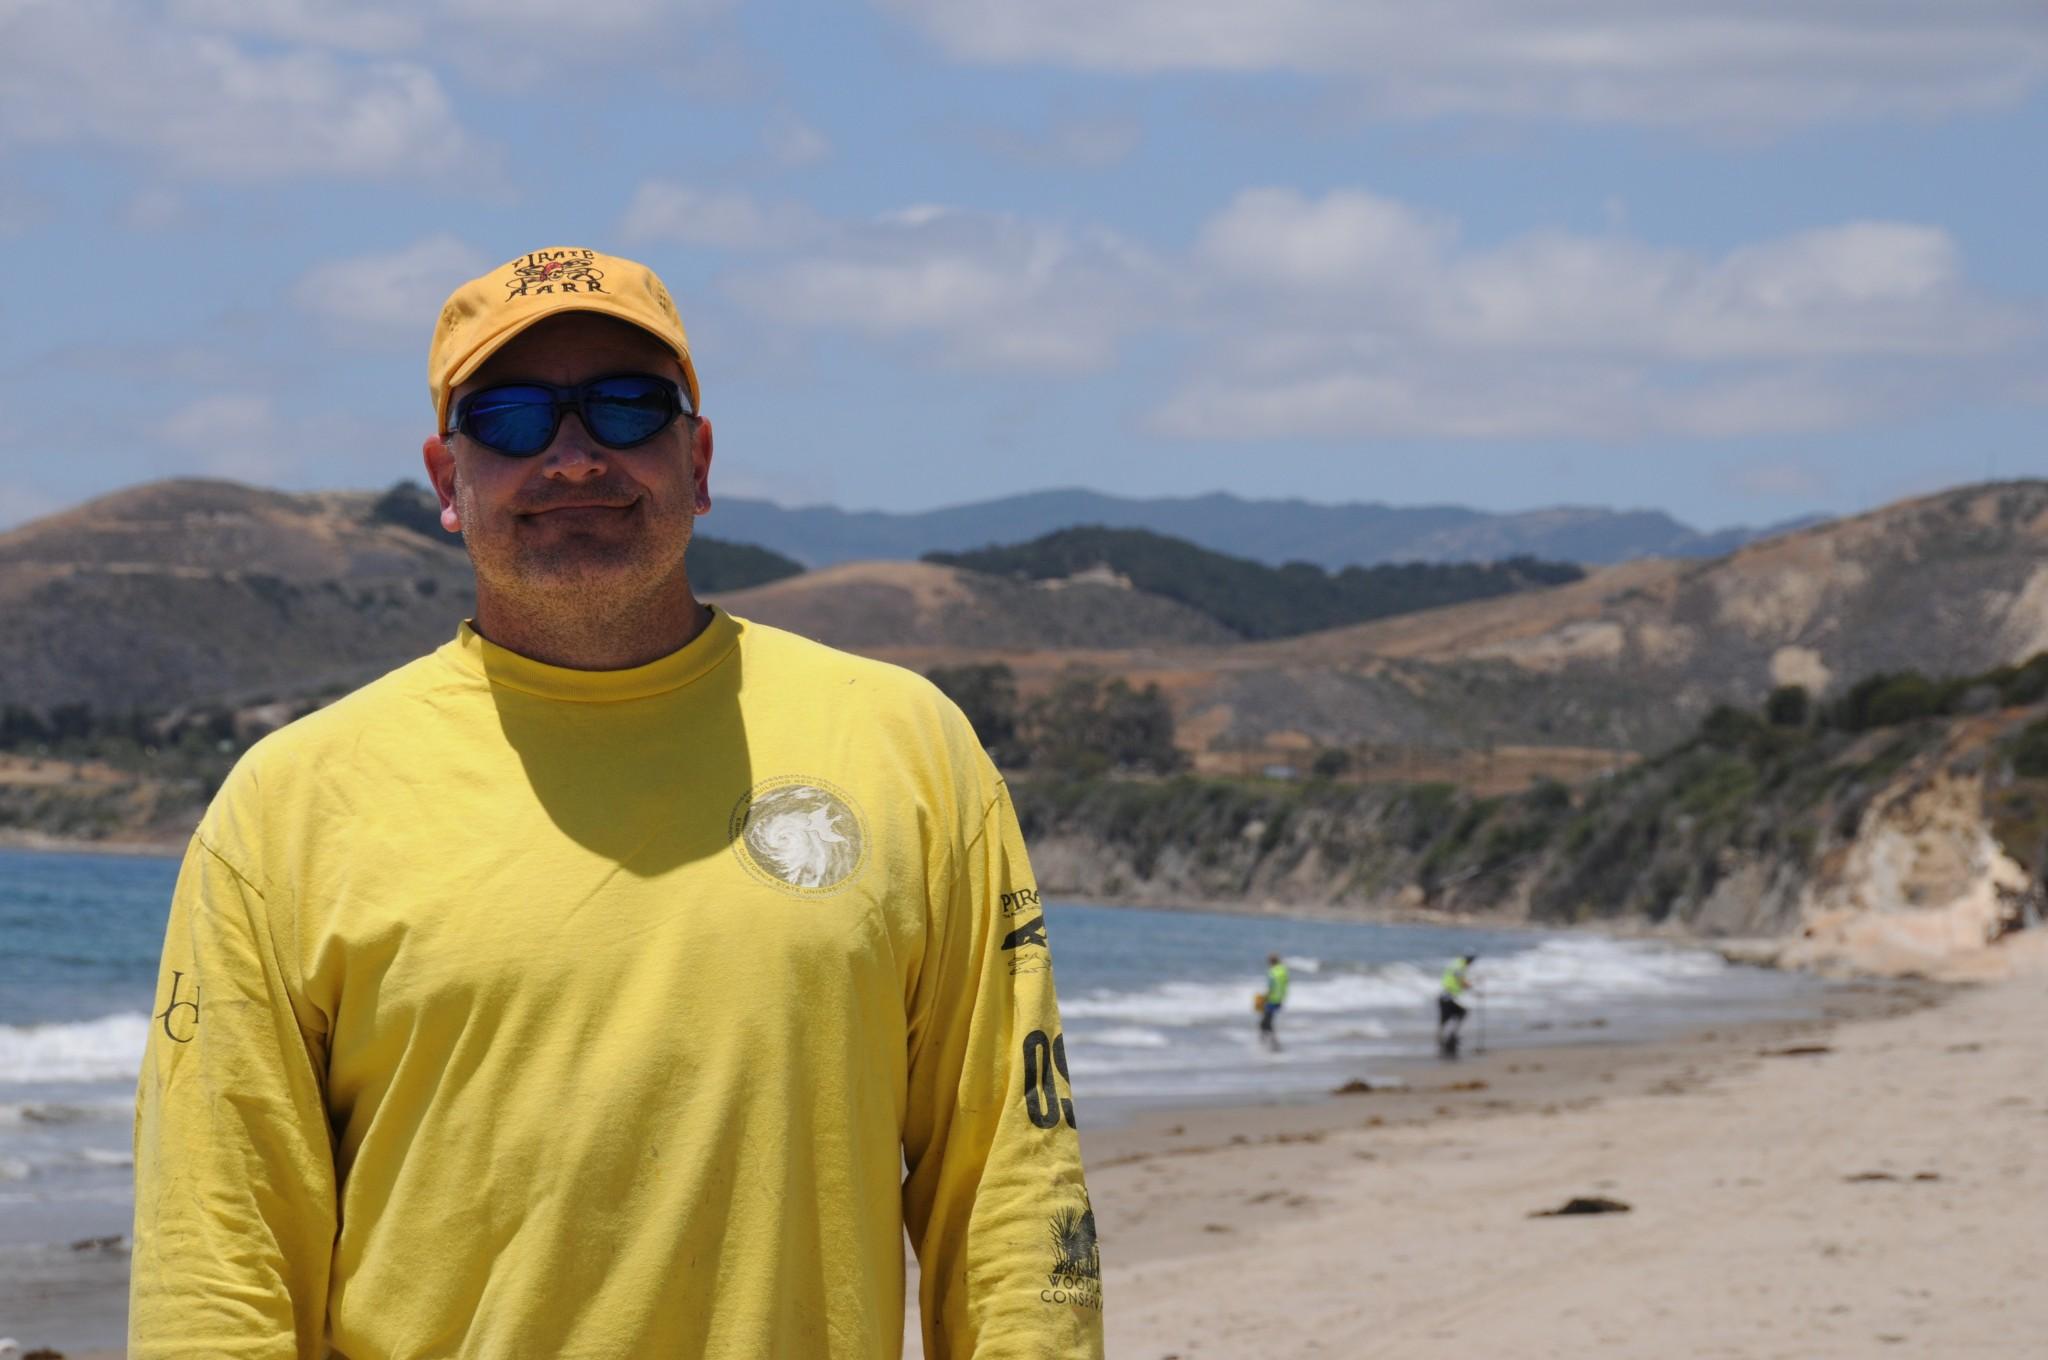 Sean El Capitan State Beach 05-20-15b copy (1)